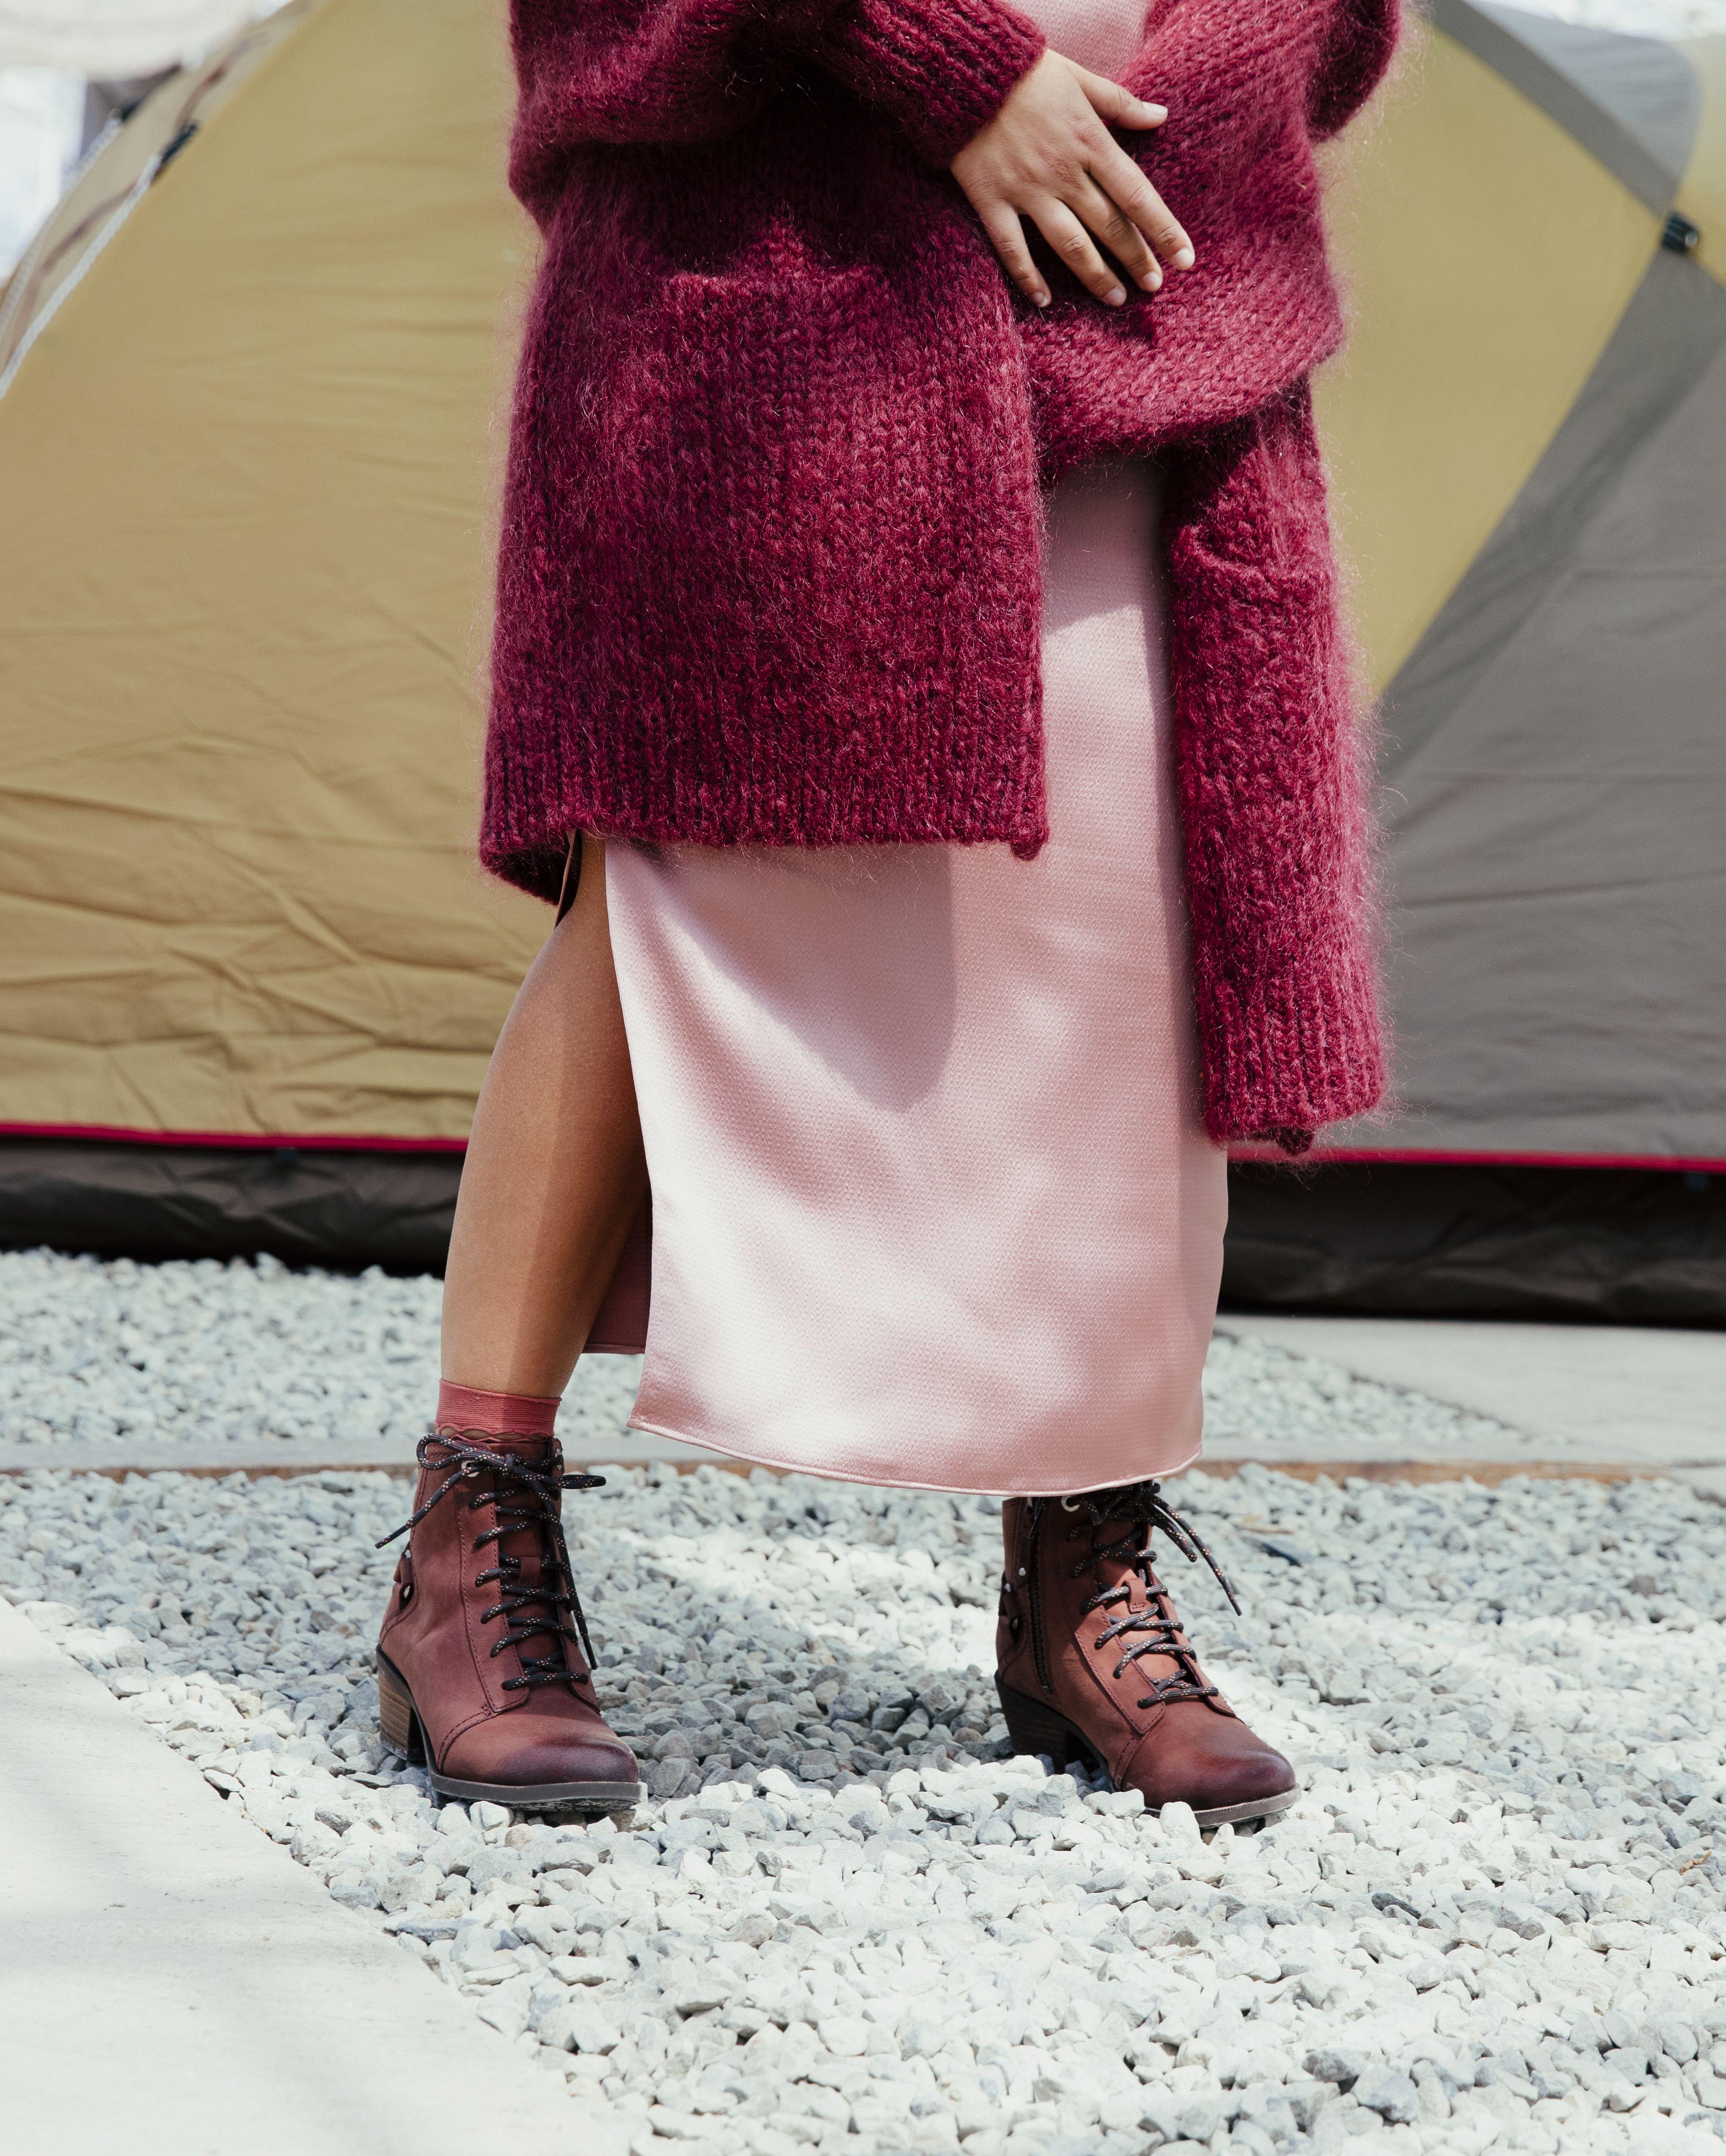 Teva boots, Womens boots